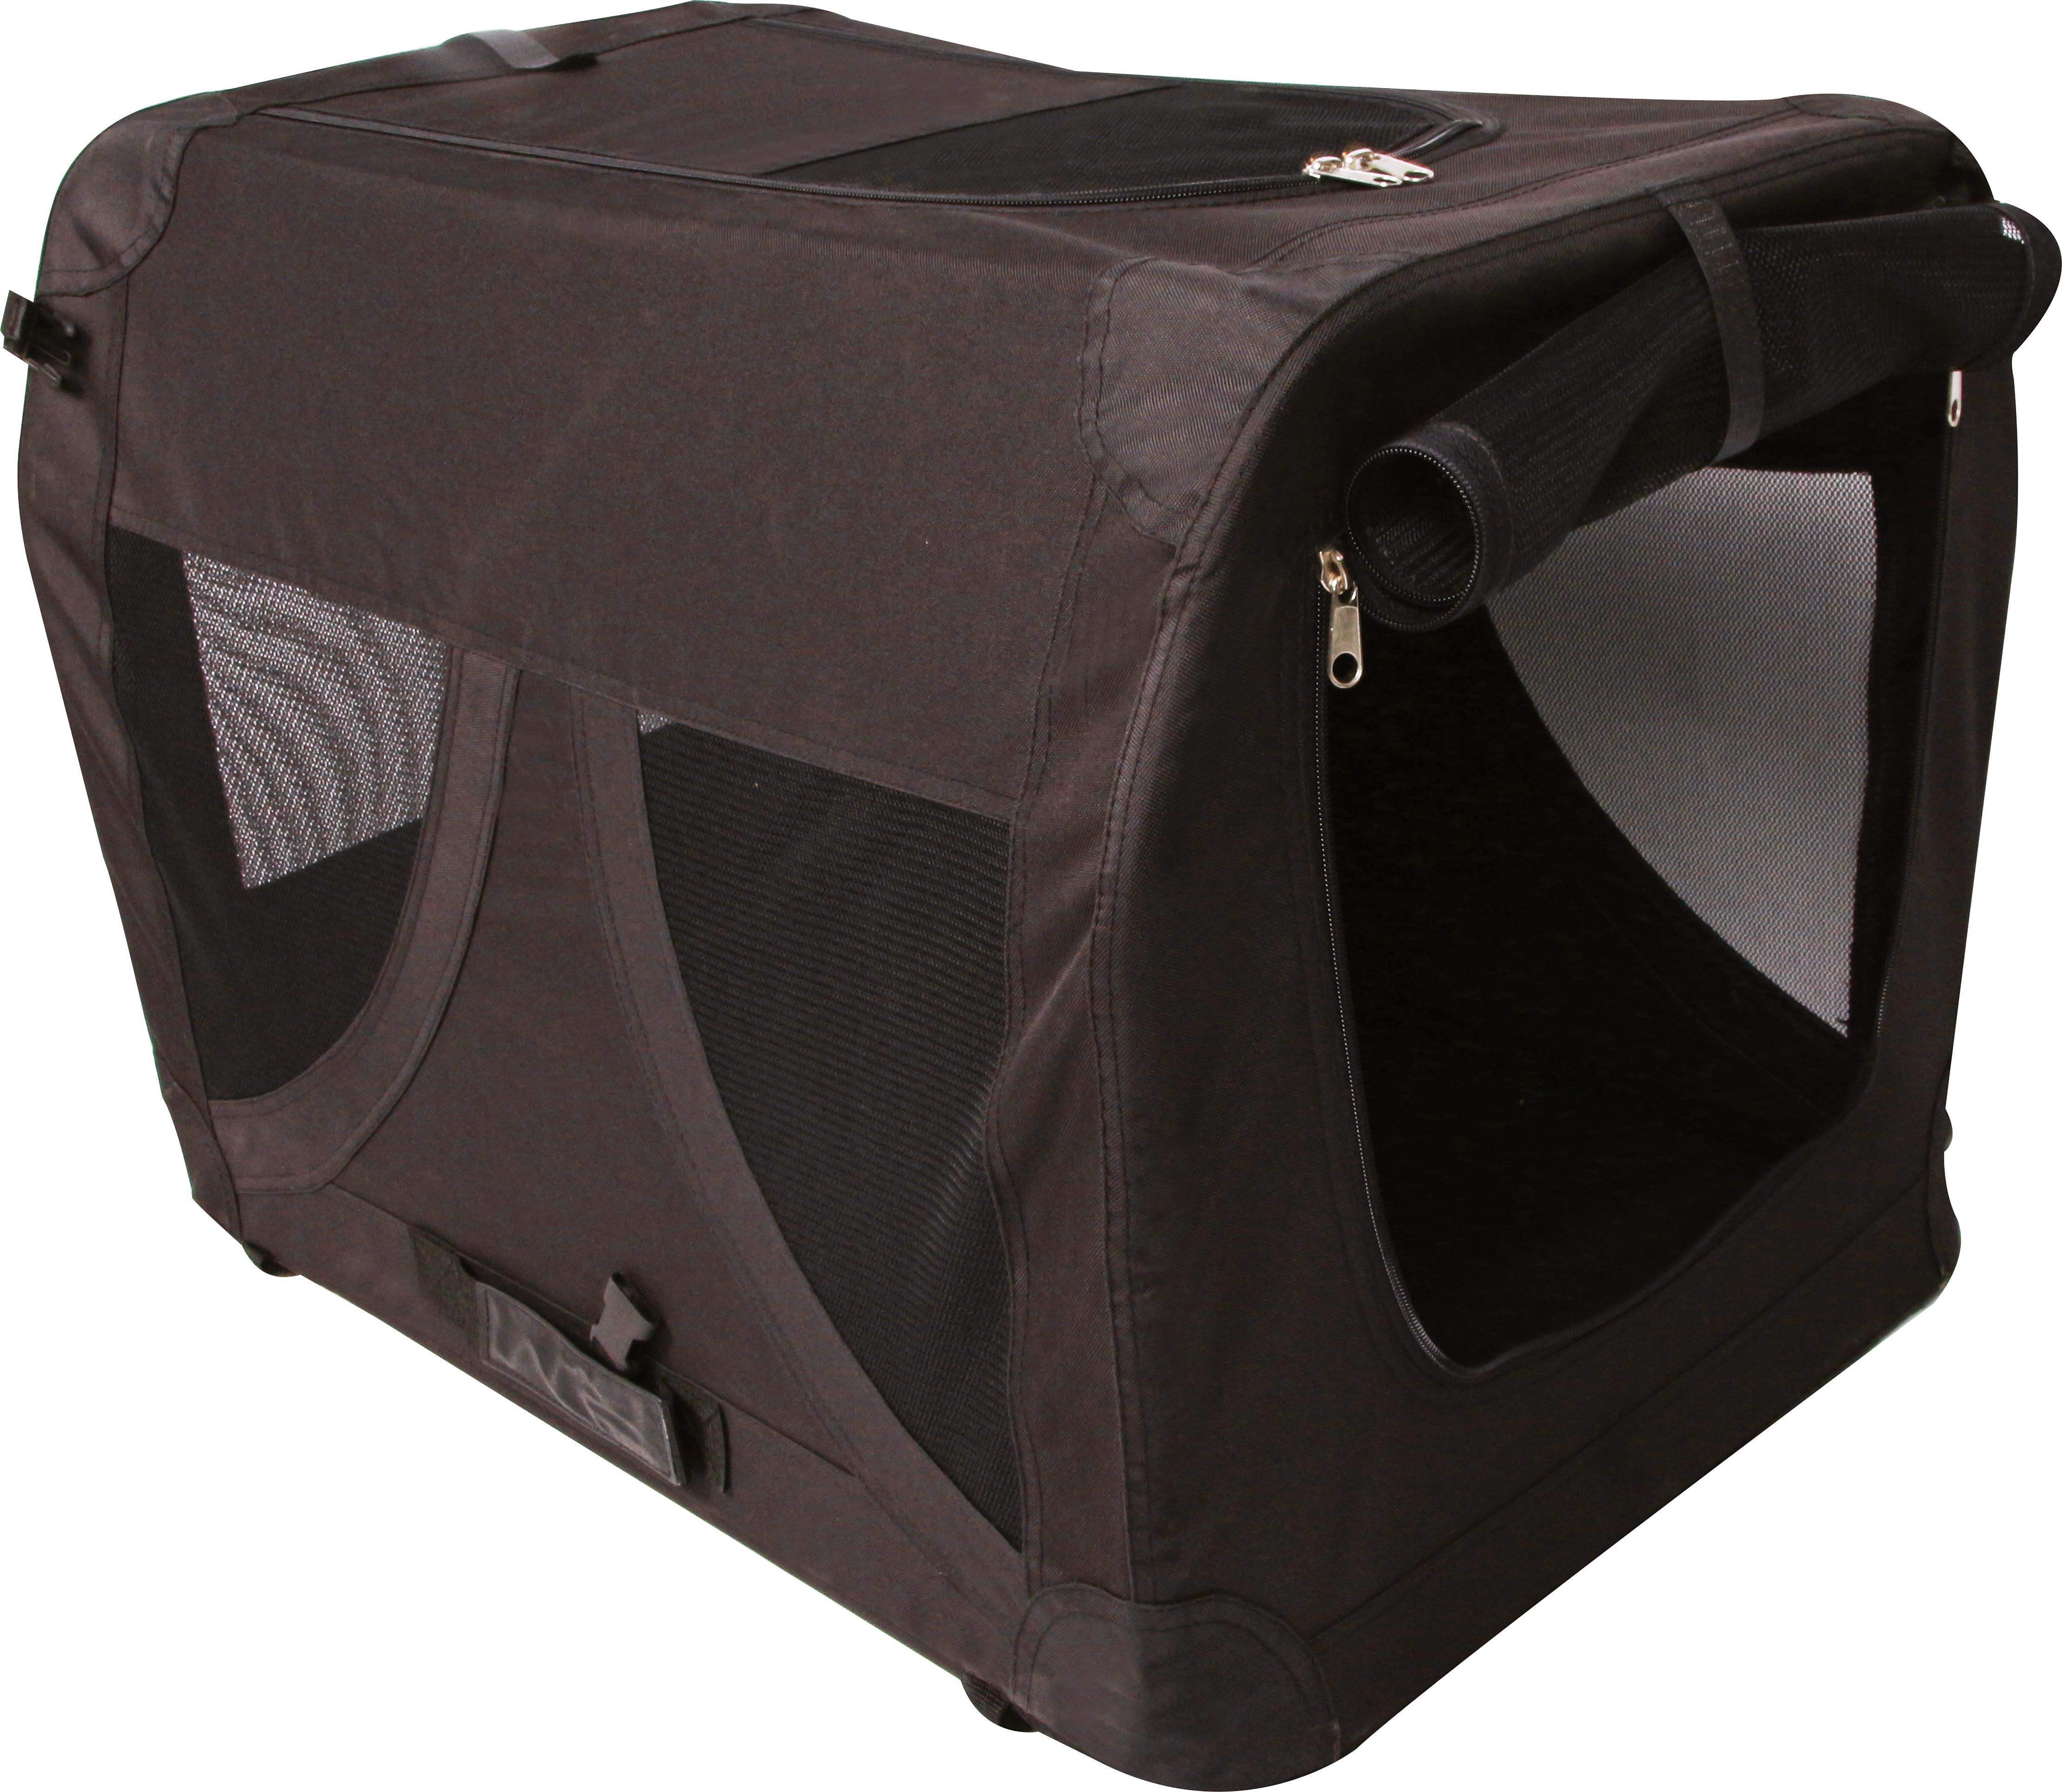 Hundbur M-Pet Comfort Crate Canvas M